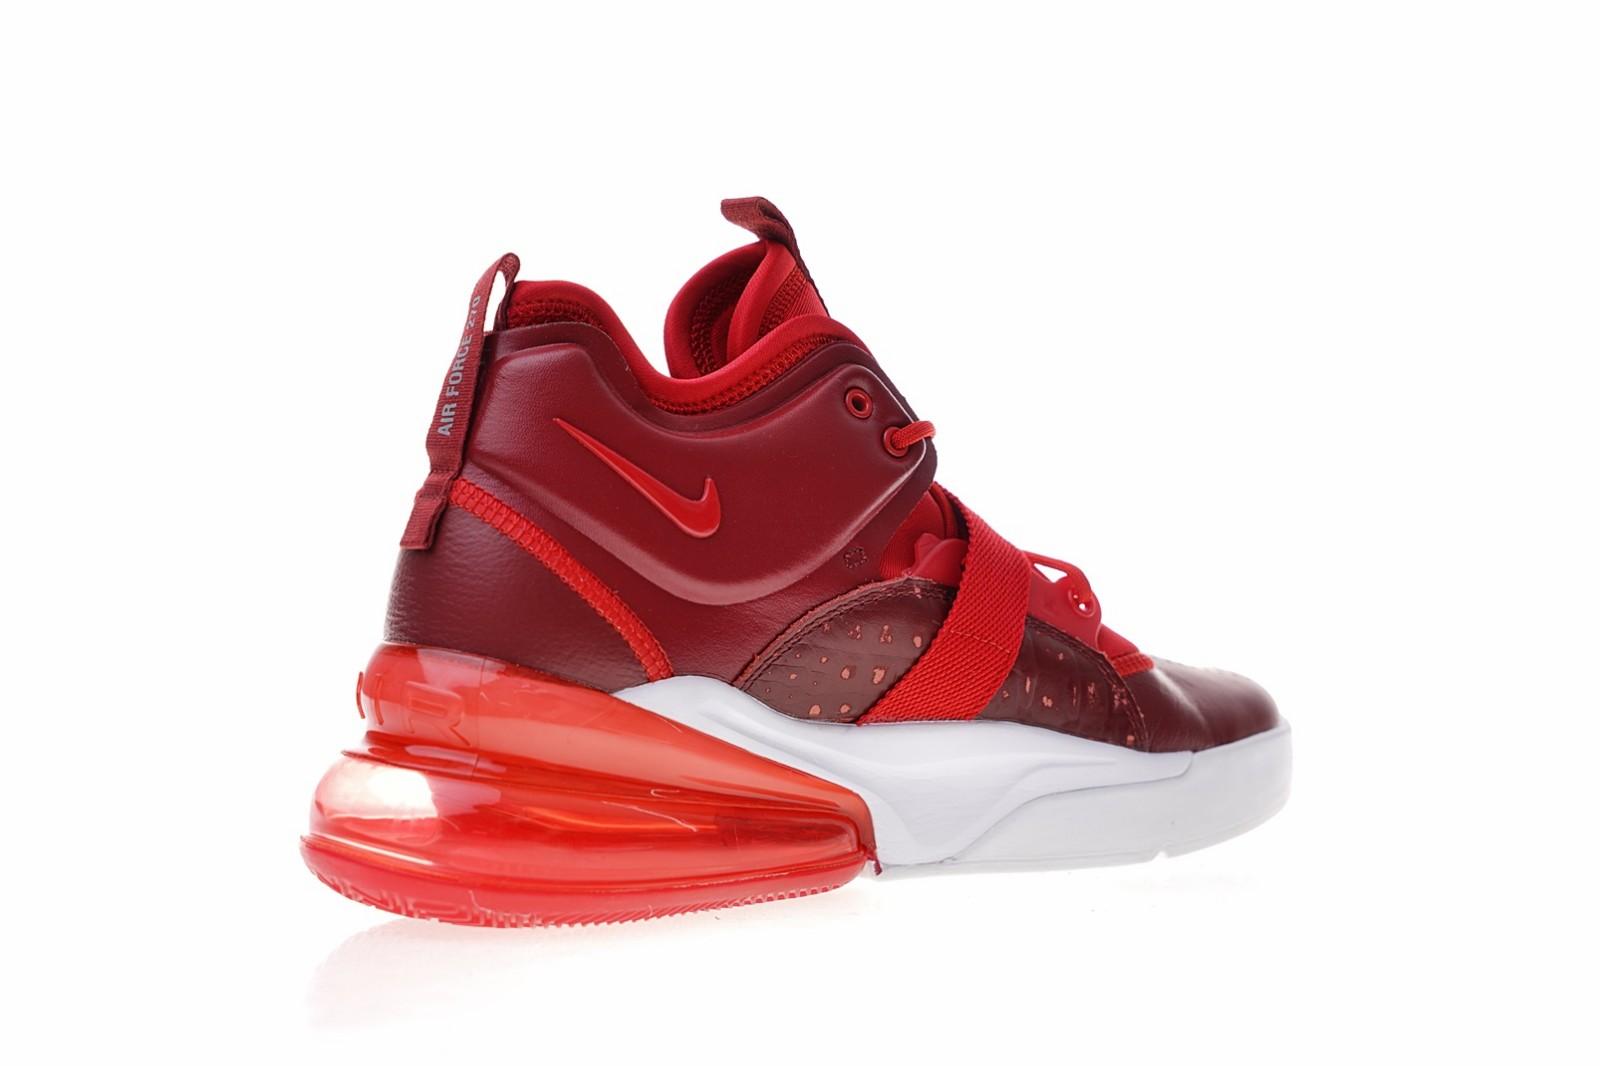 77ec86f1eed511 Nike Air Force 270 Red Croc Gym Red White AH6772-600 - Febbuy